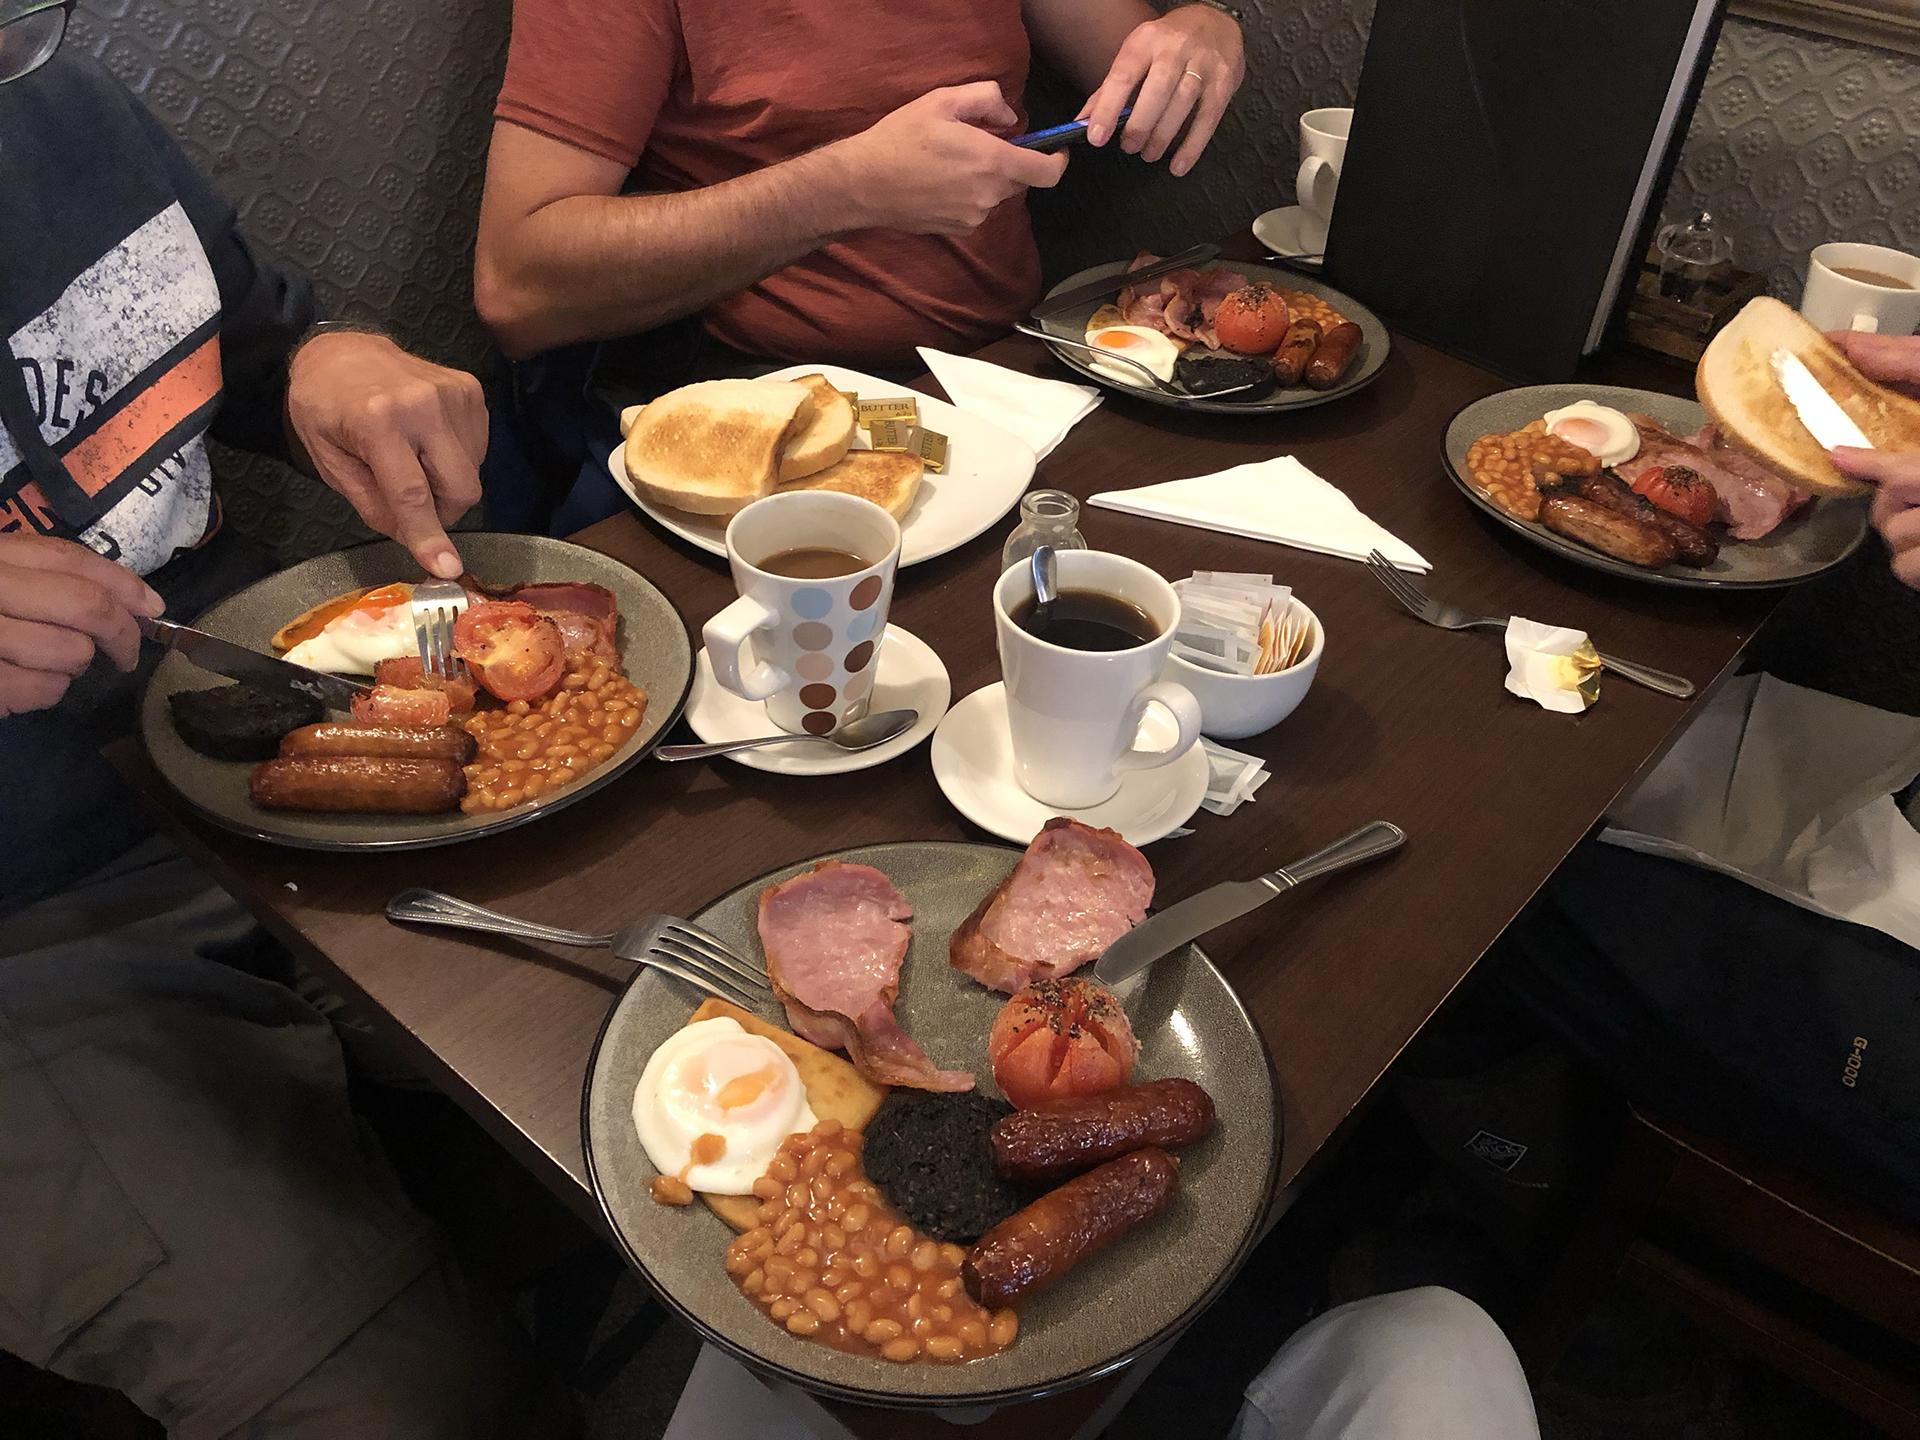 scottish breakfast.jpg